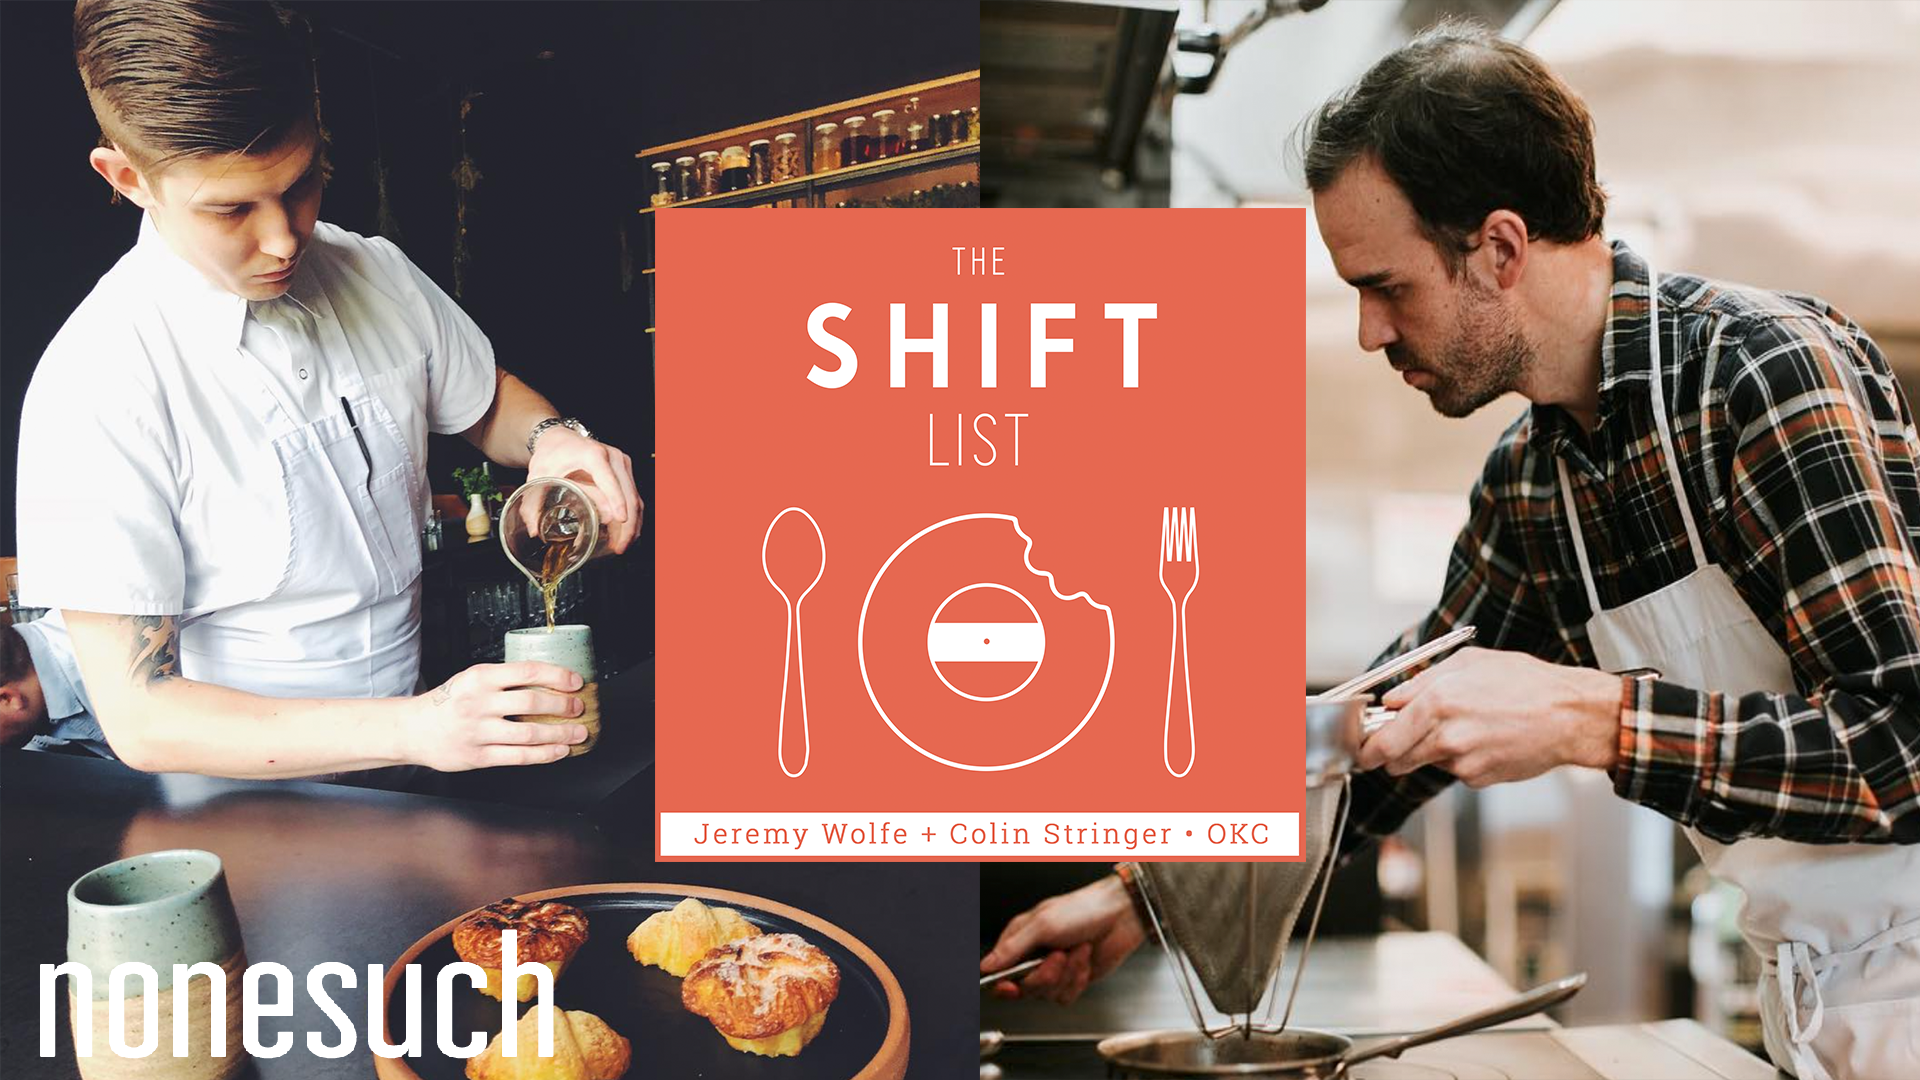 The Shift List - Nonesuch, Oklahoma City